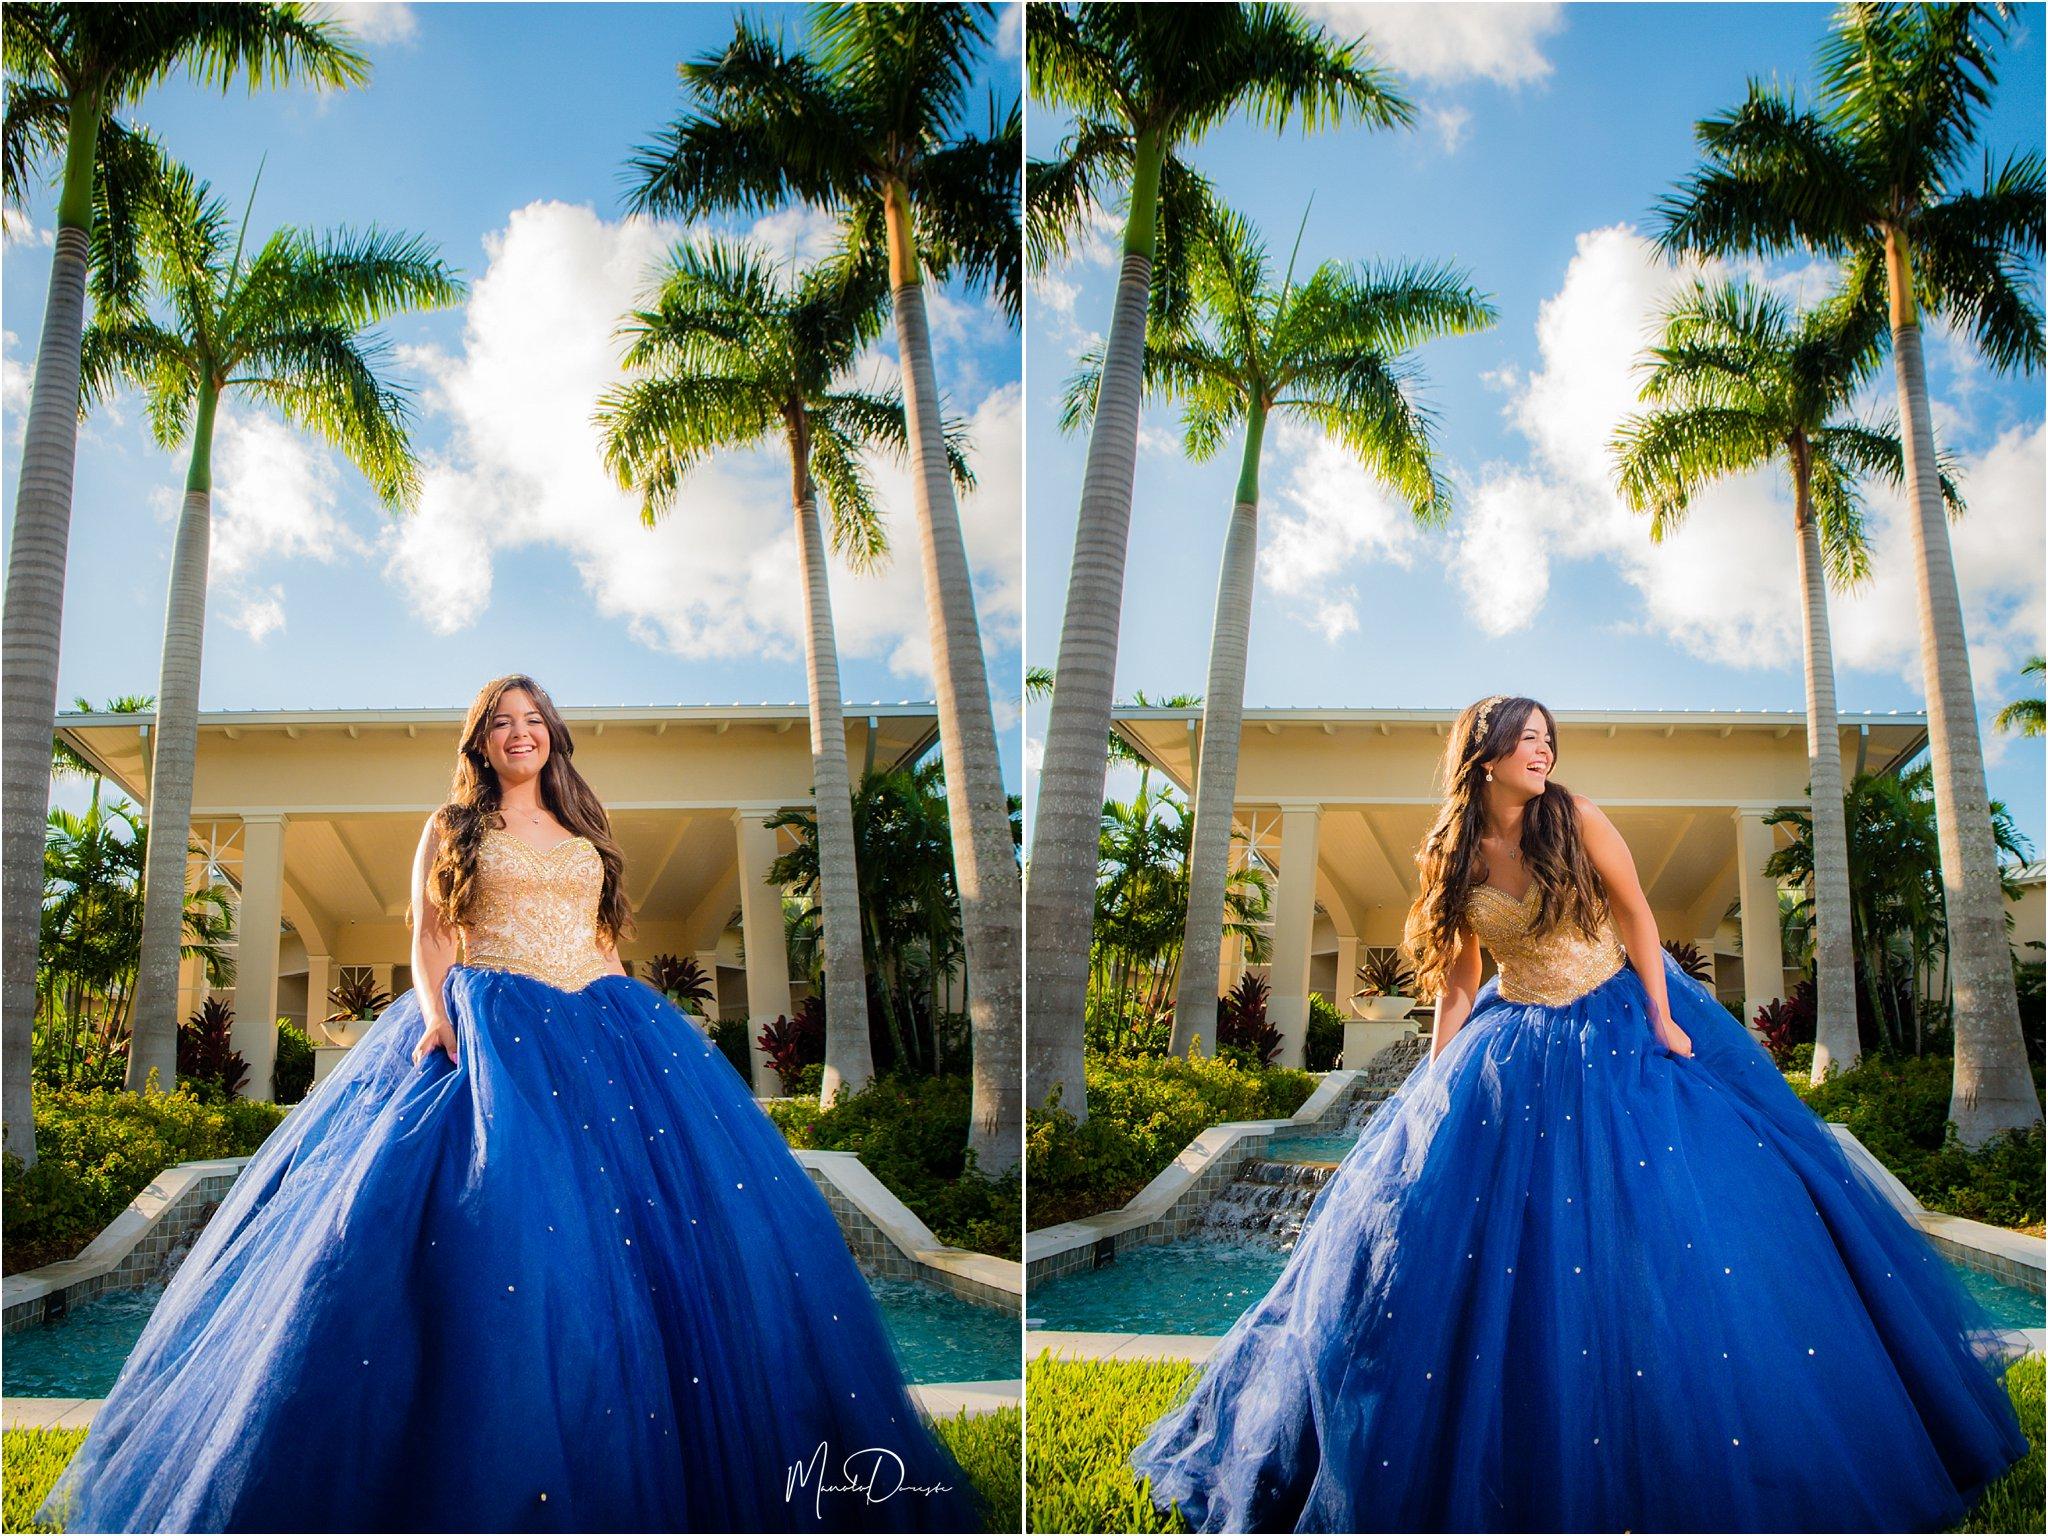 0280_ManoloDoreste_InFocusStudios_Wedding_Family_Photography_Miami_MiamiPhotographer.jpg